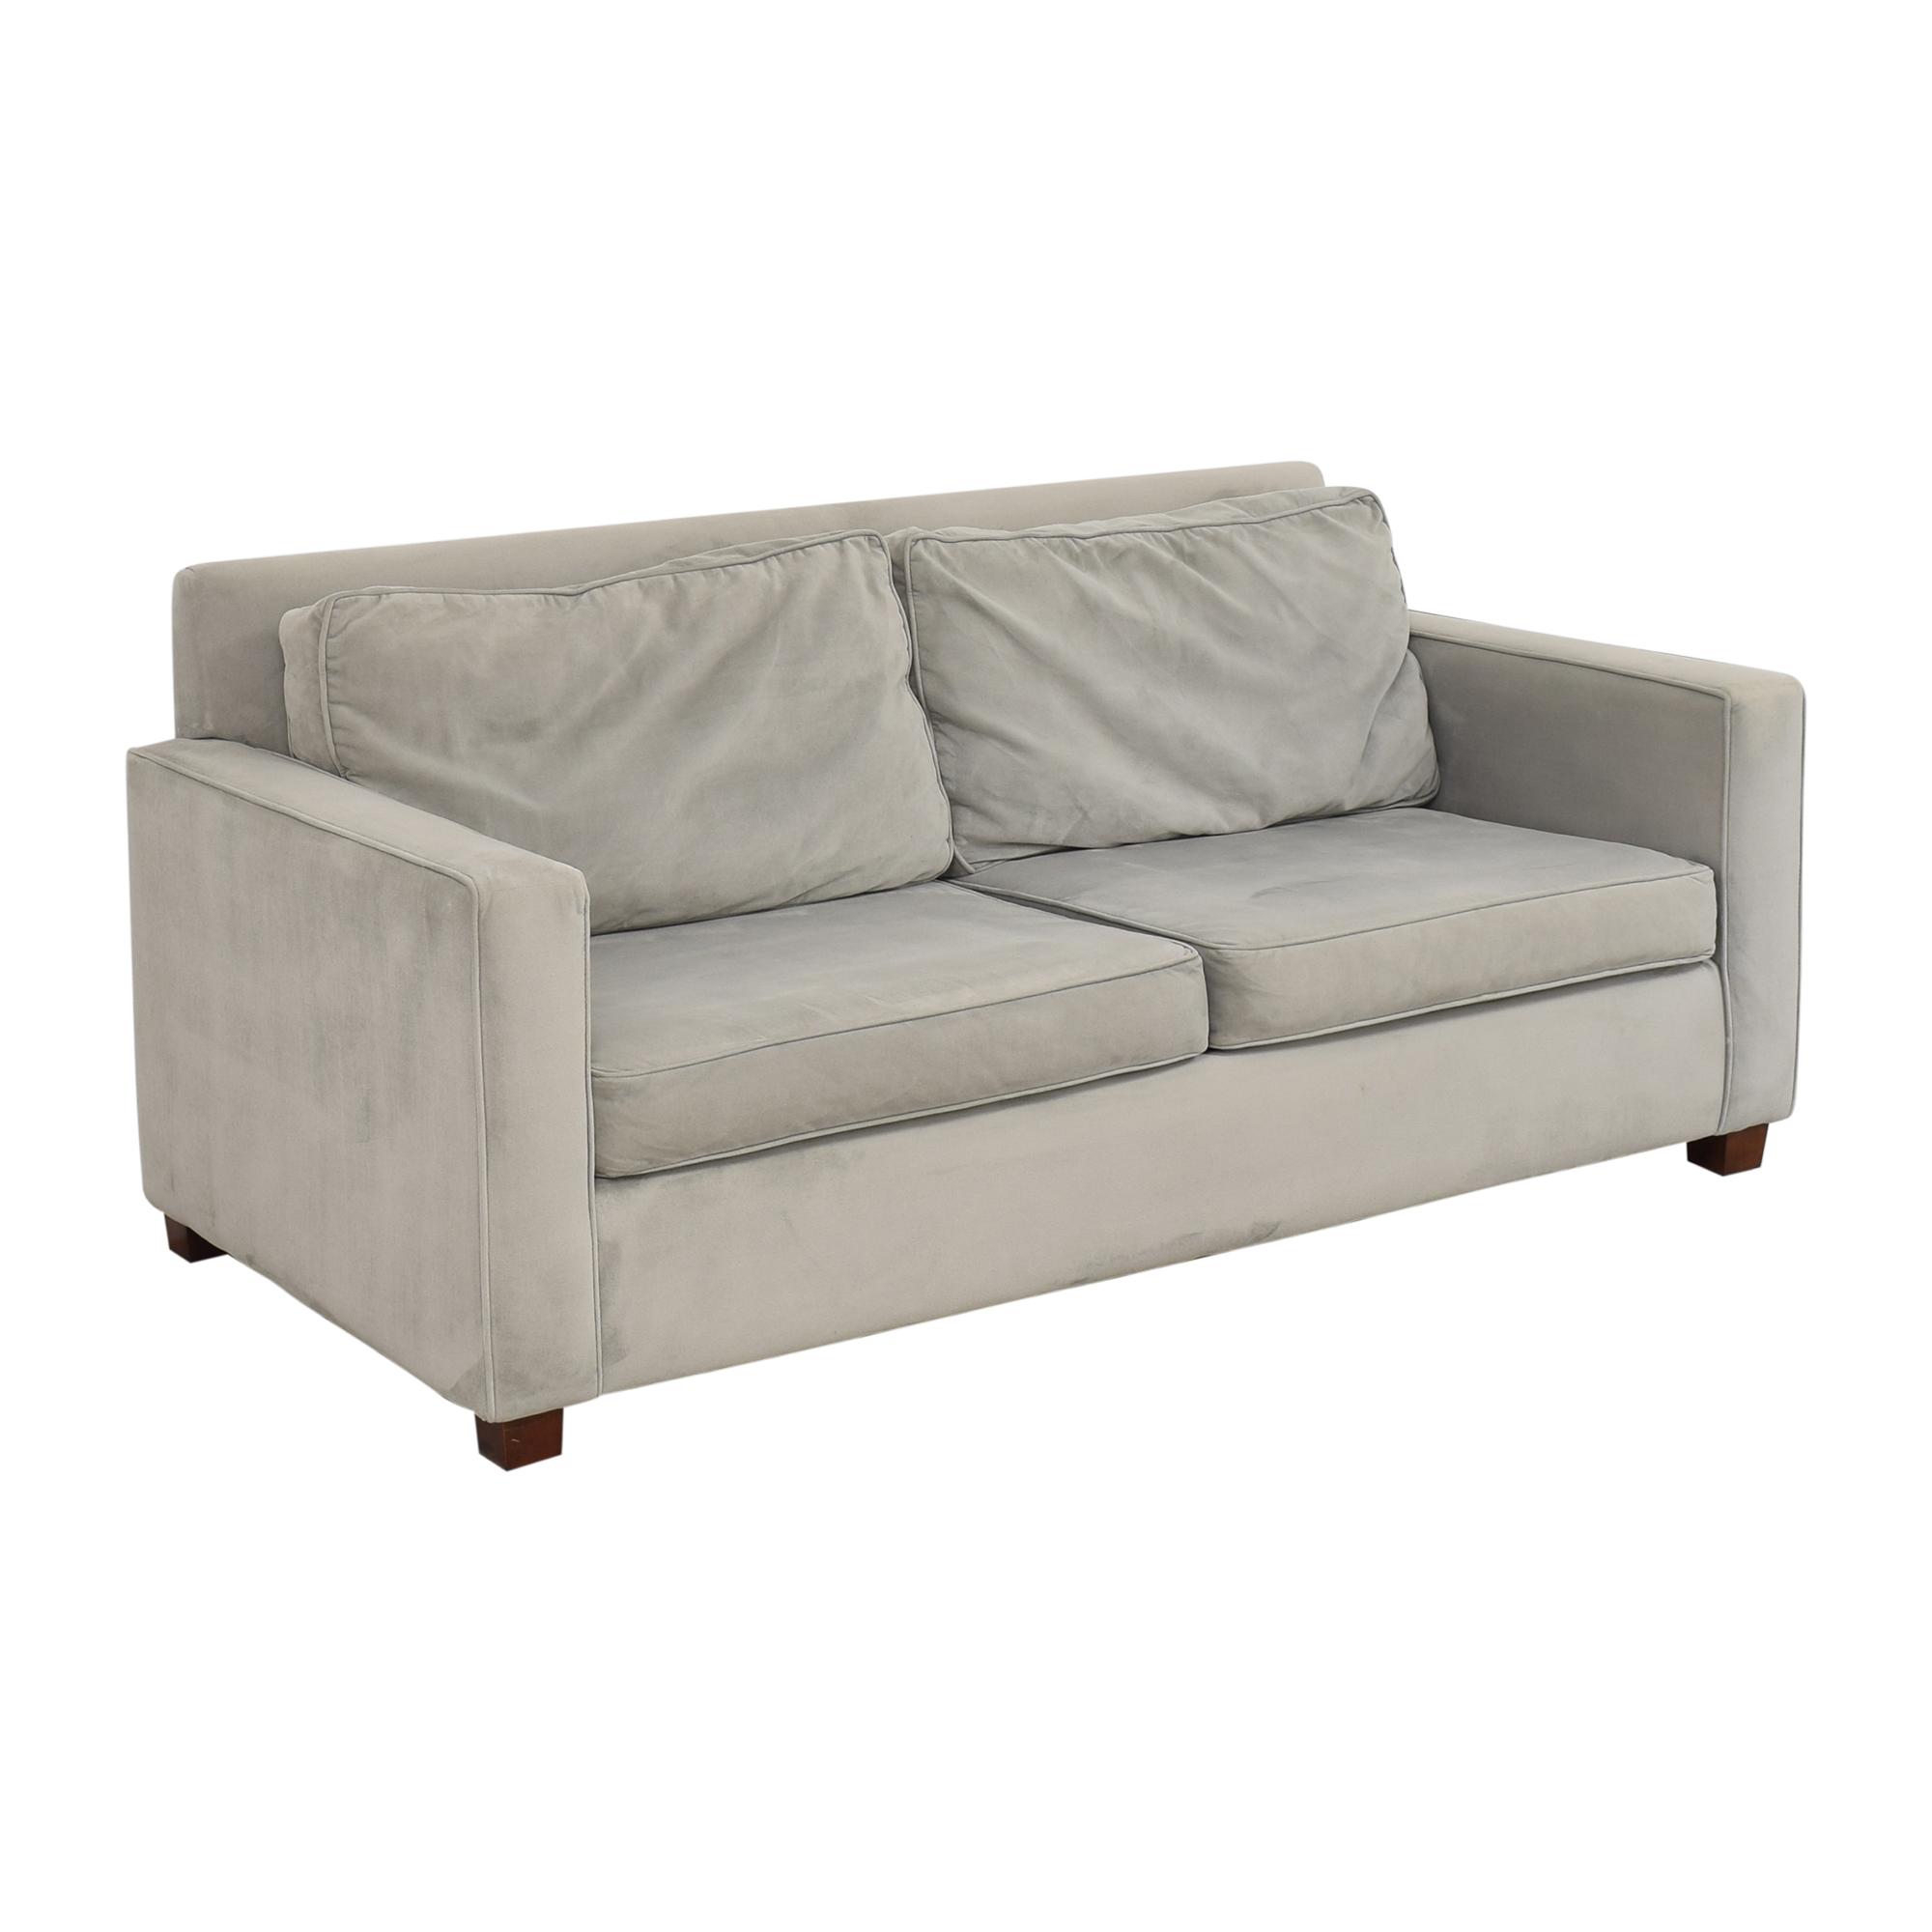 West Elm West Elm Henry Two Cushion Sofa Sofas